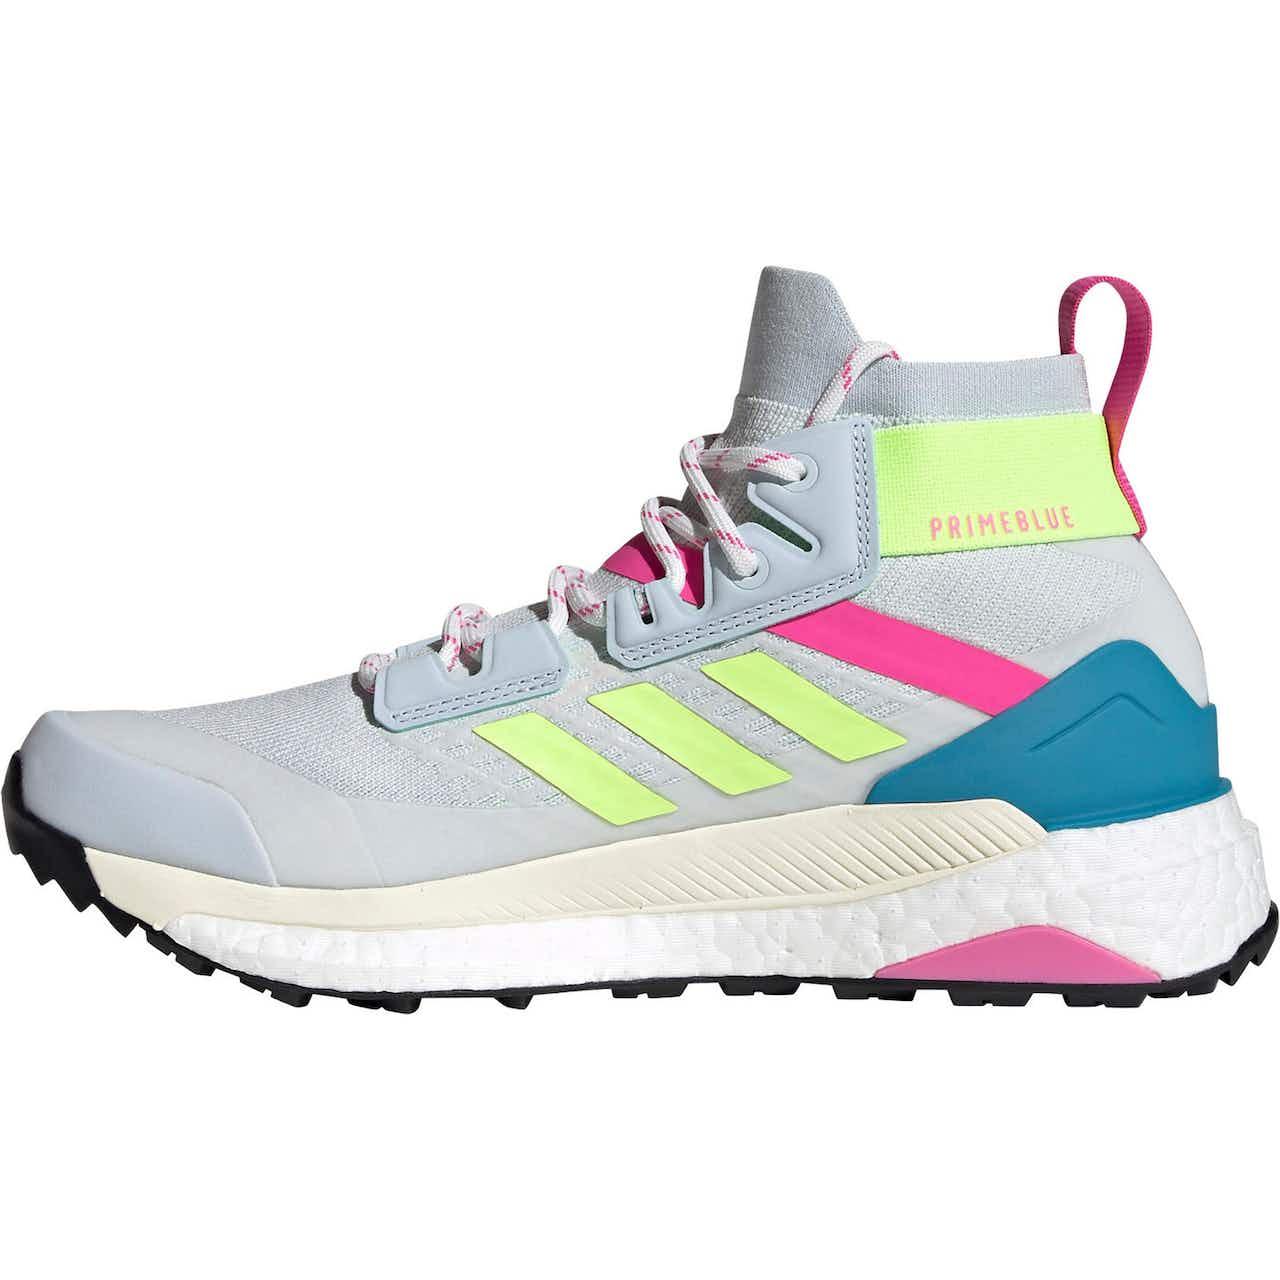 adidas Free Hiker Primeblue Wanderschuhe Damen